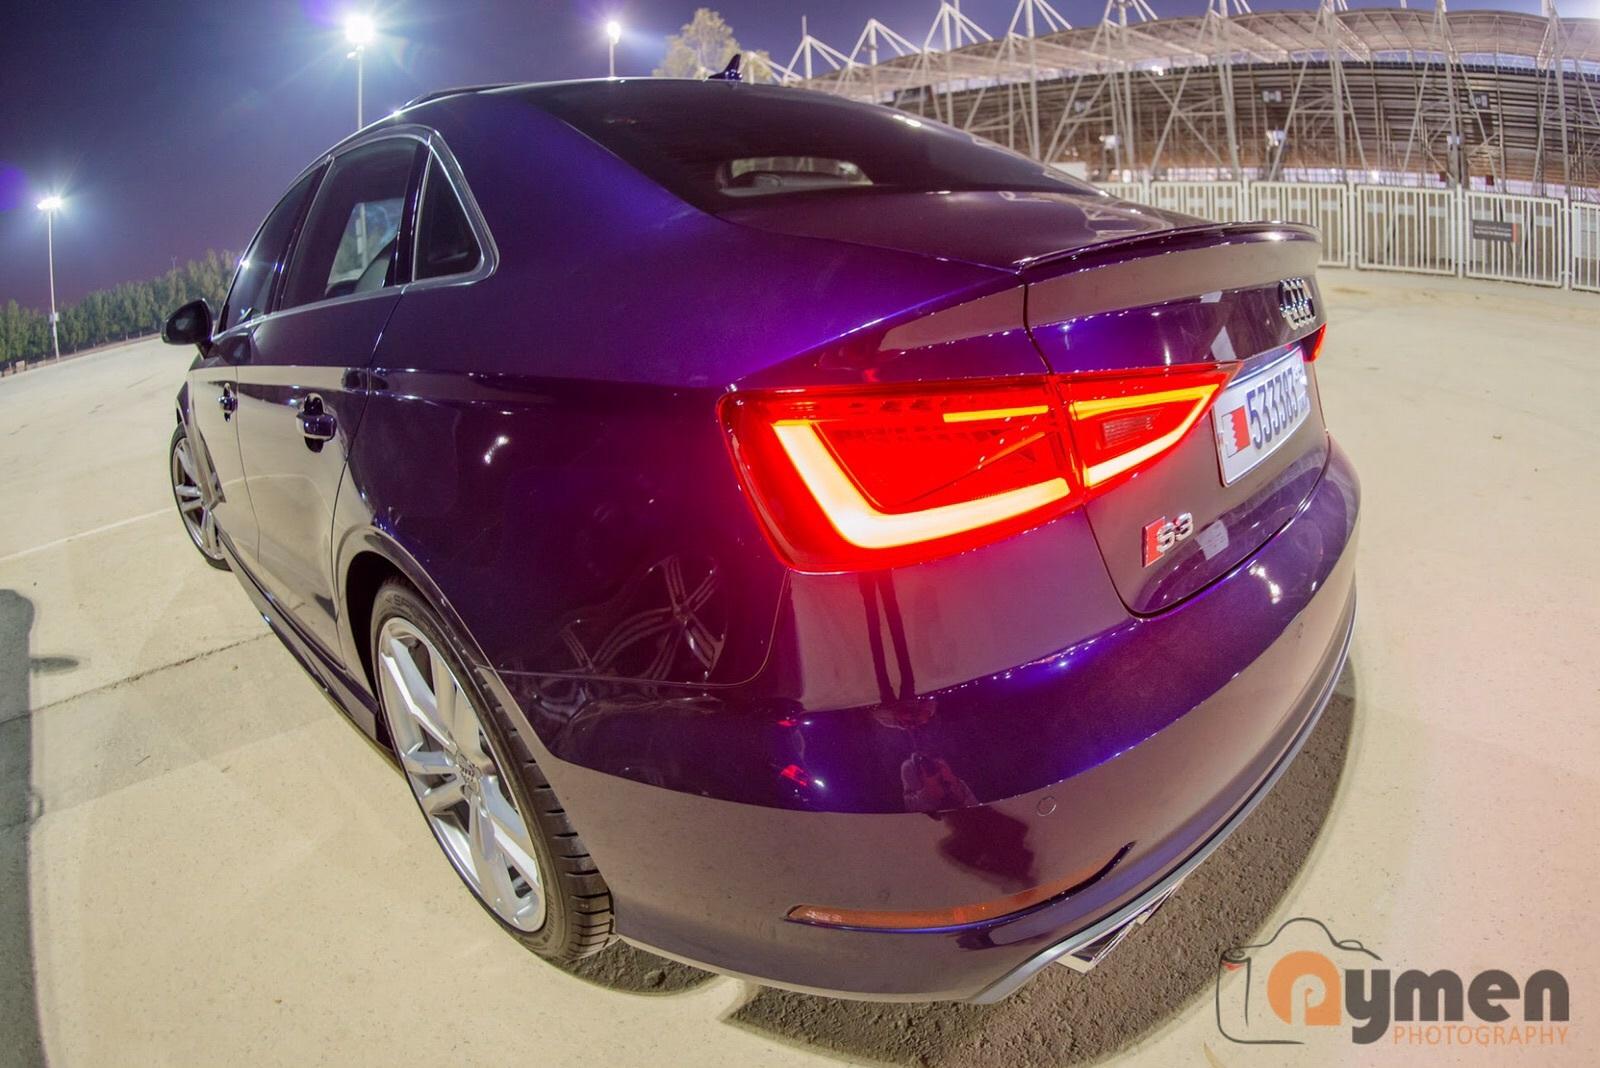 Exclussive Samtviolett Perleffekt 2016 Audi S3 Sedan